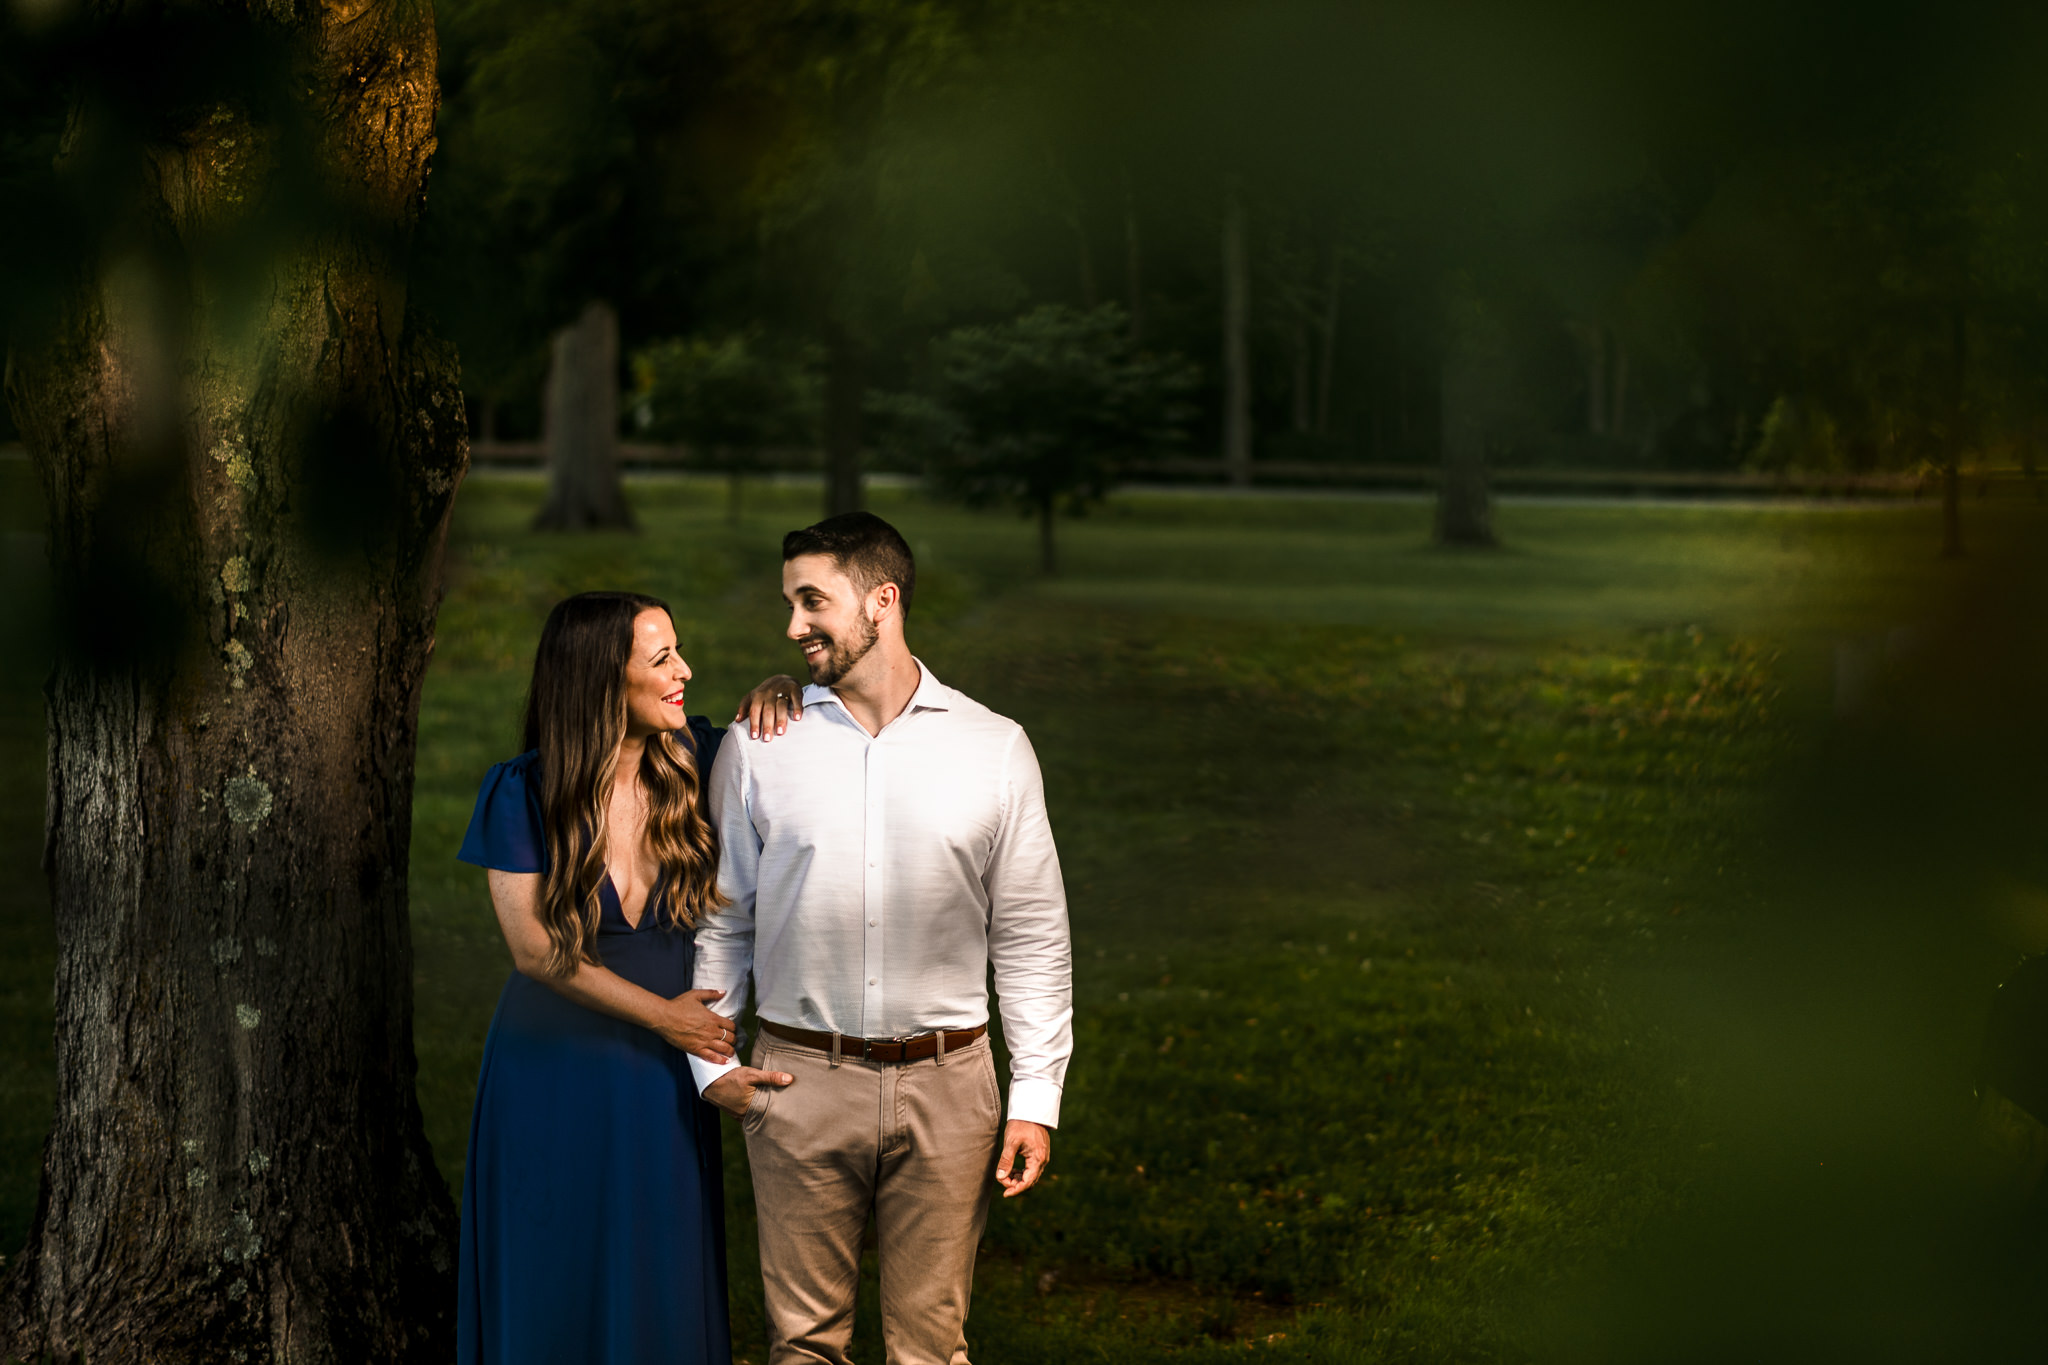 McKowen-Natirar-Park-Engagement-Photos-15.JPG